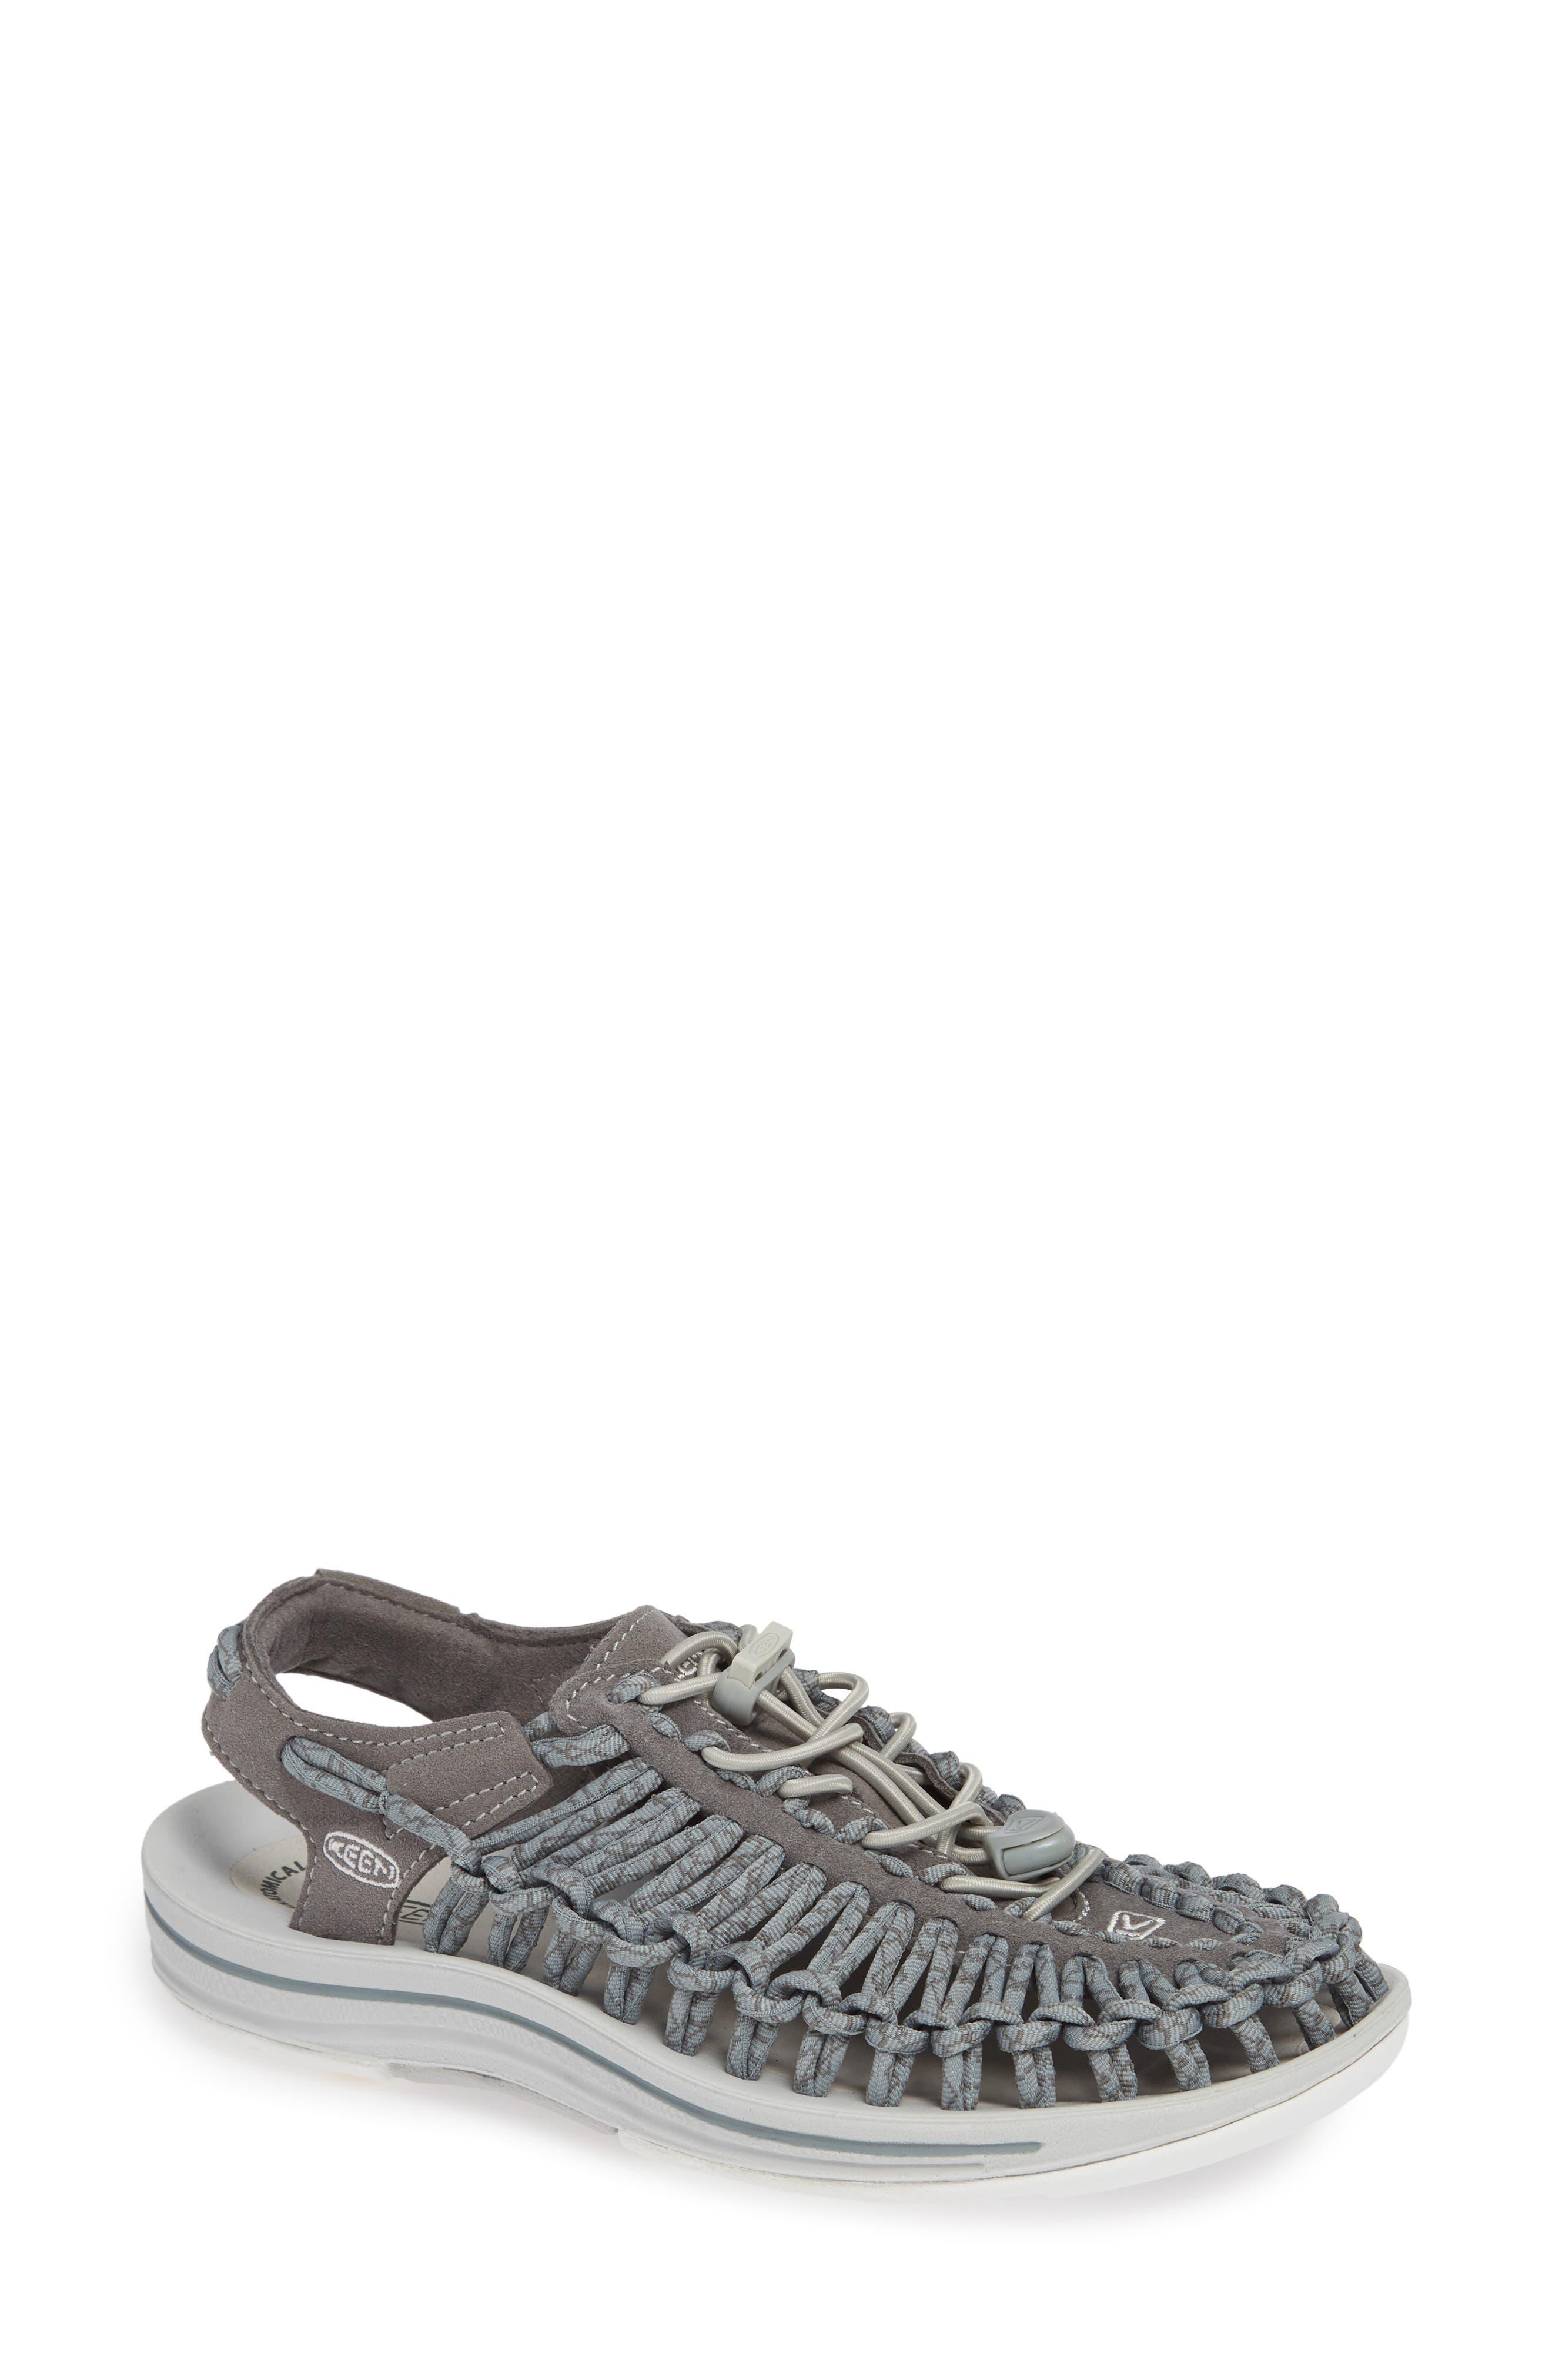 b4681d7c230 Keen Women's Shoes